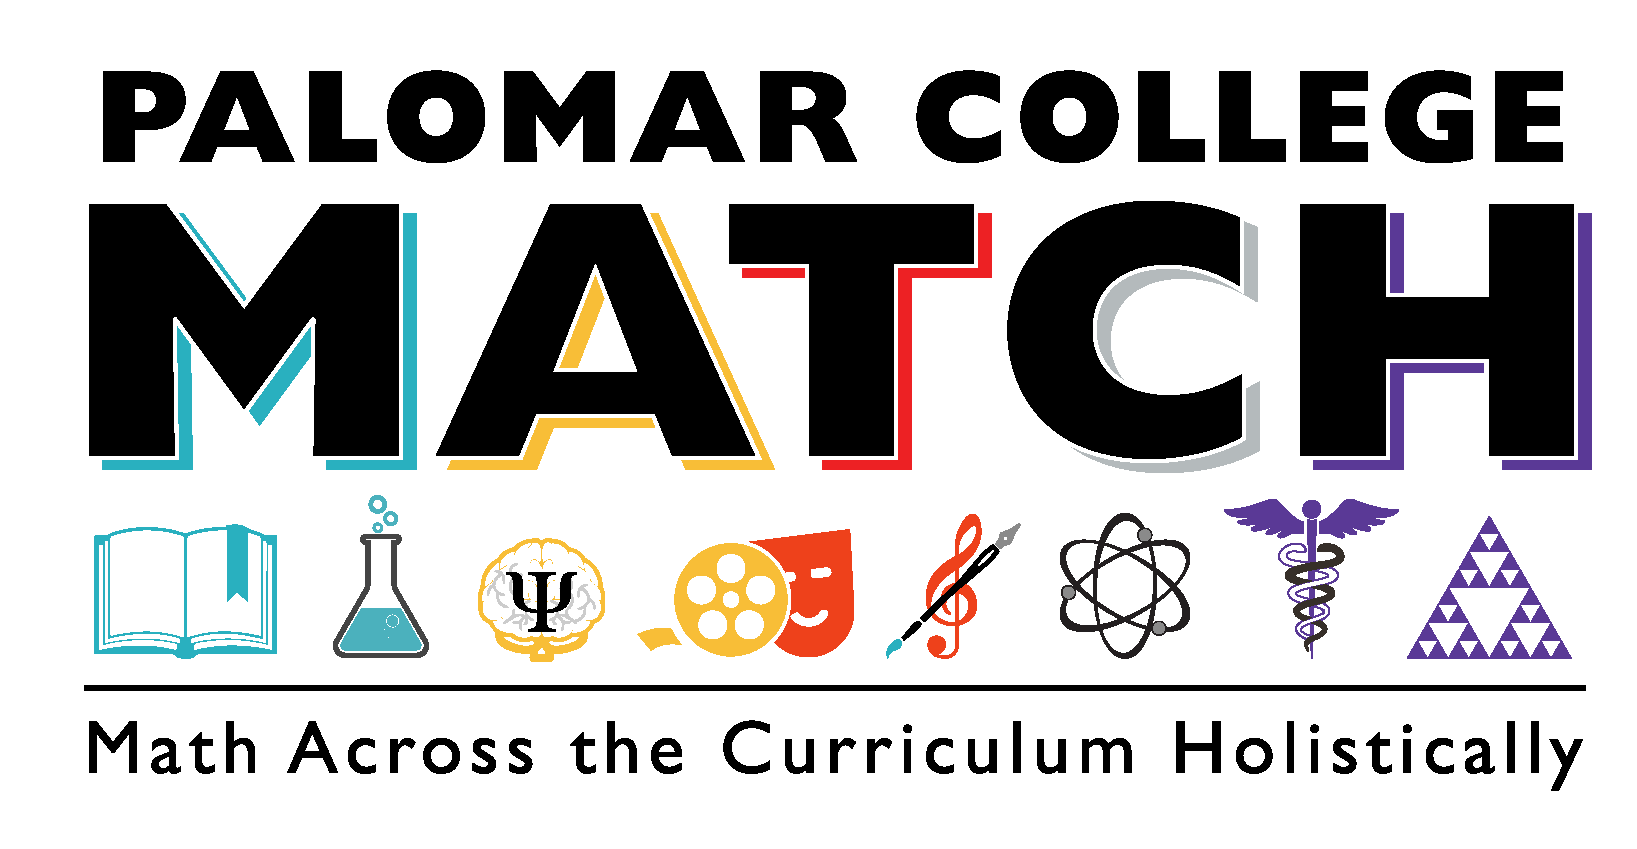 Palomar College MATCH - Math Across the Curriculum Holistically LOGO